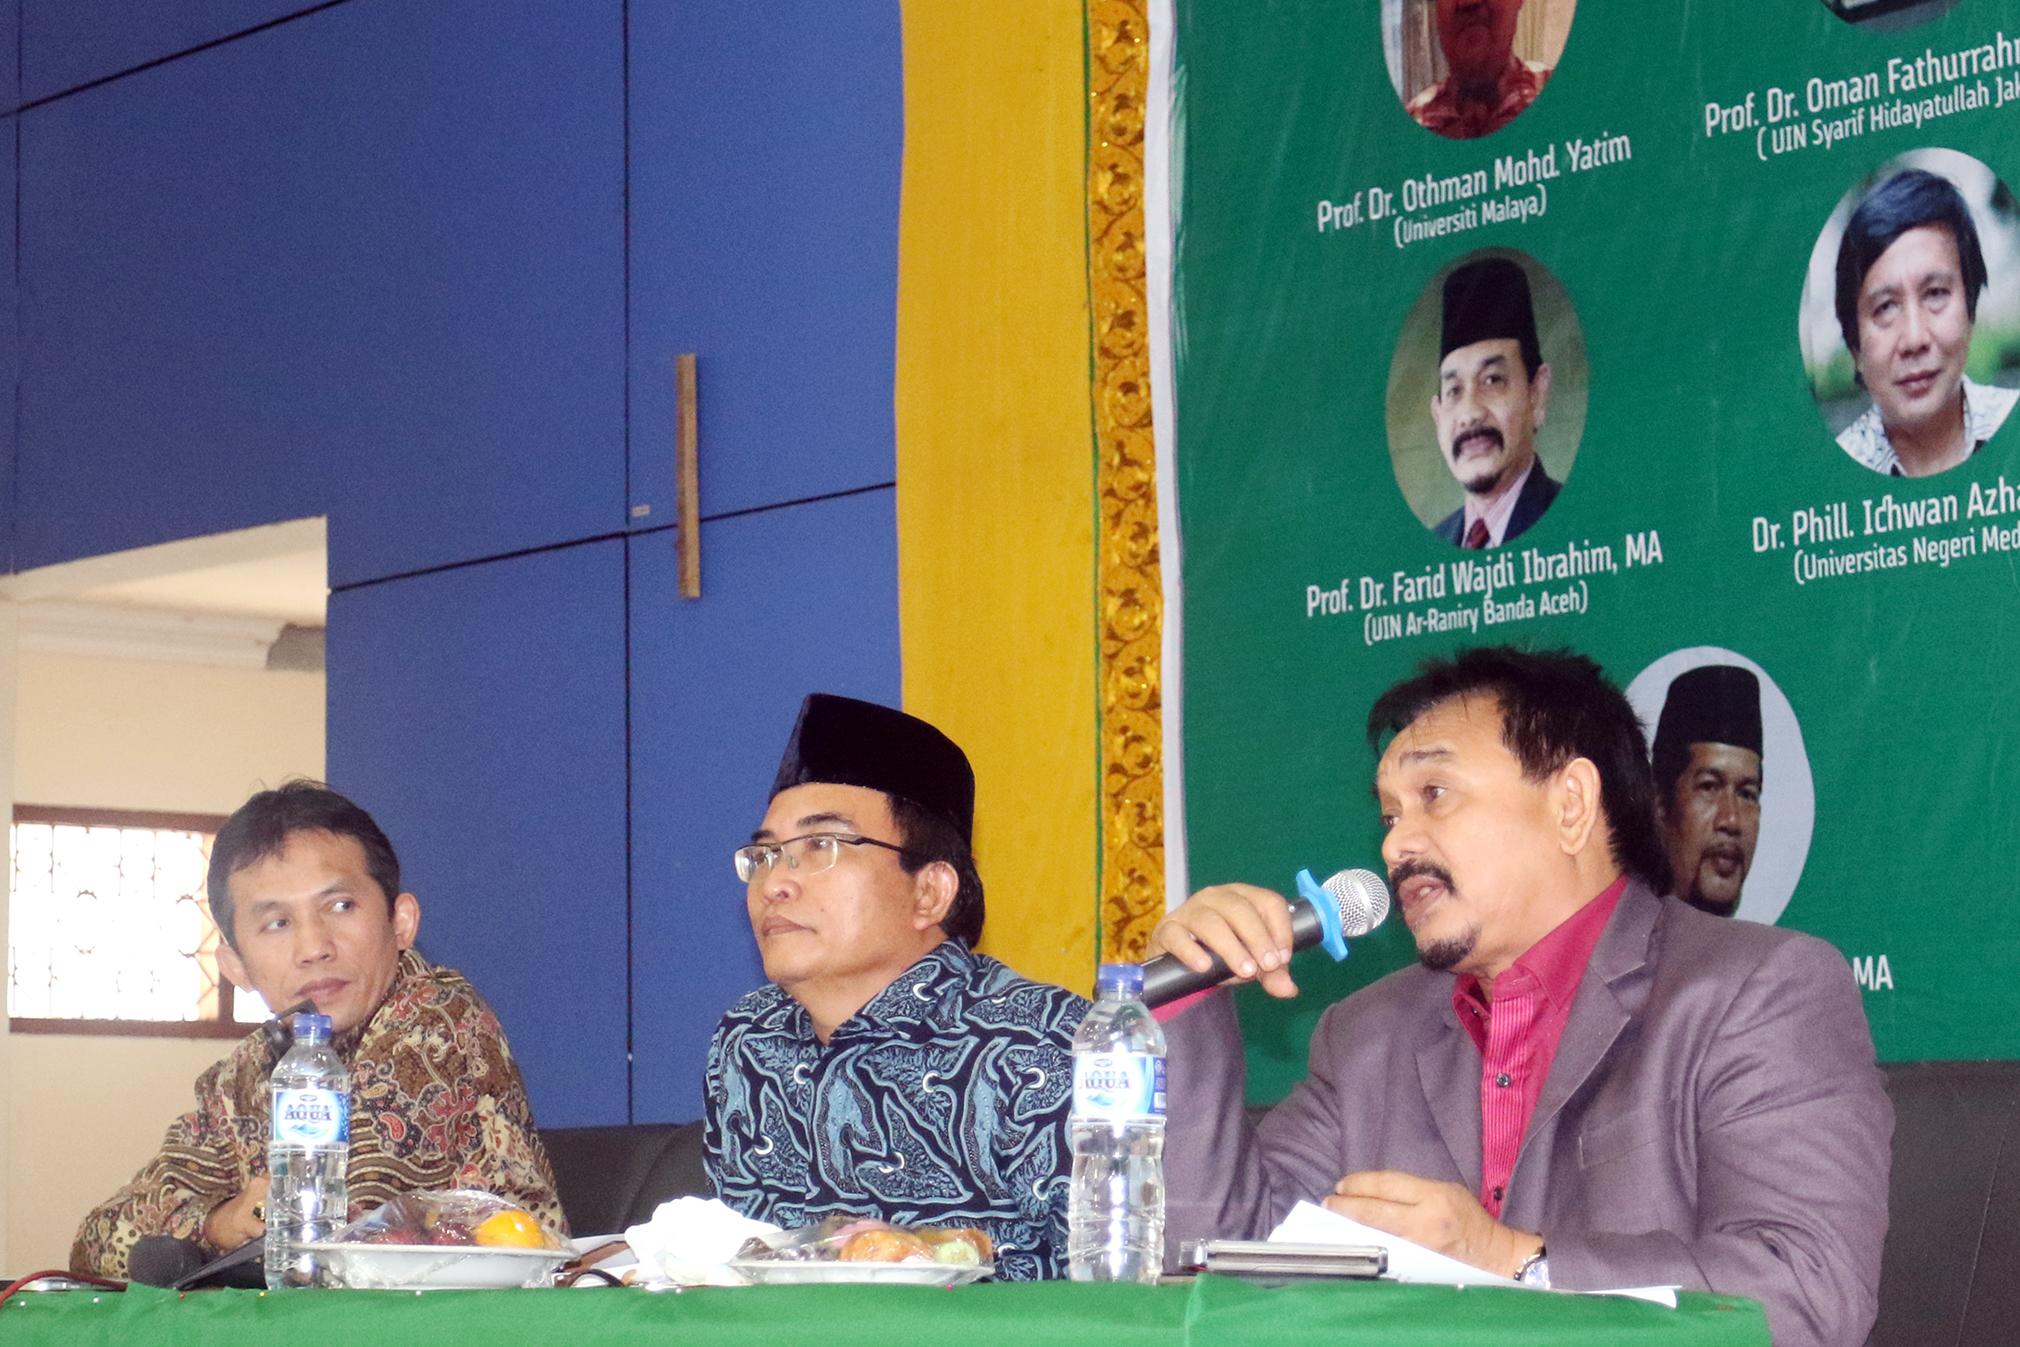 Semua sudah sepakat Aceh sebagai titik nol Islam Nusantara